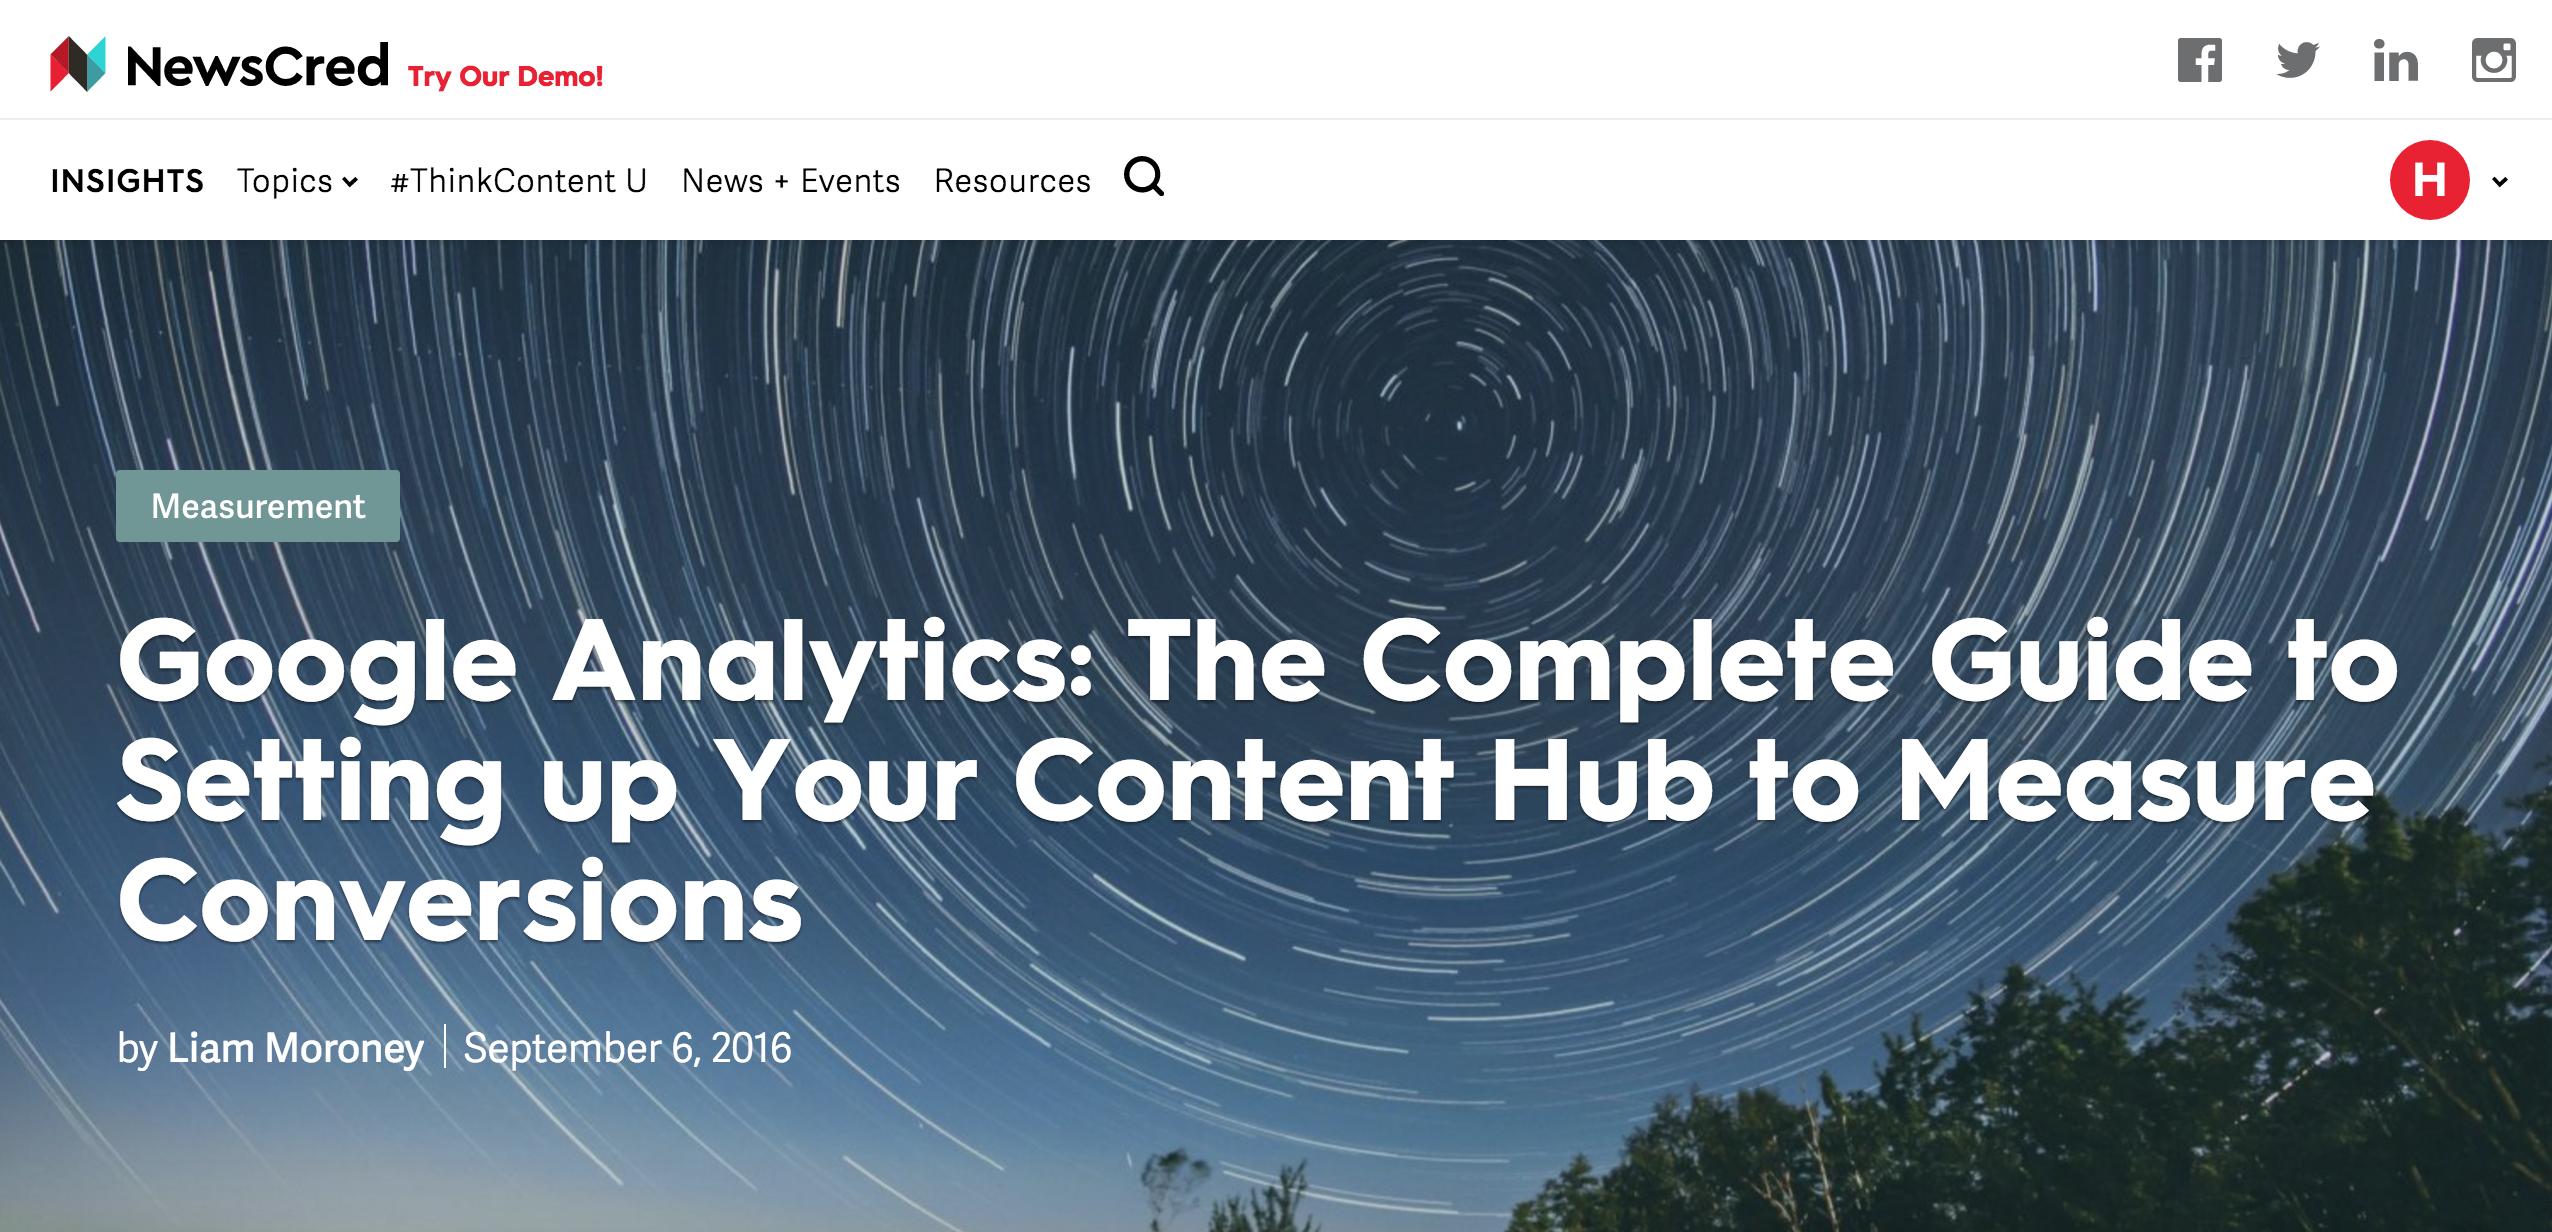 Google_Analytics_Blog_Post.png